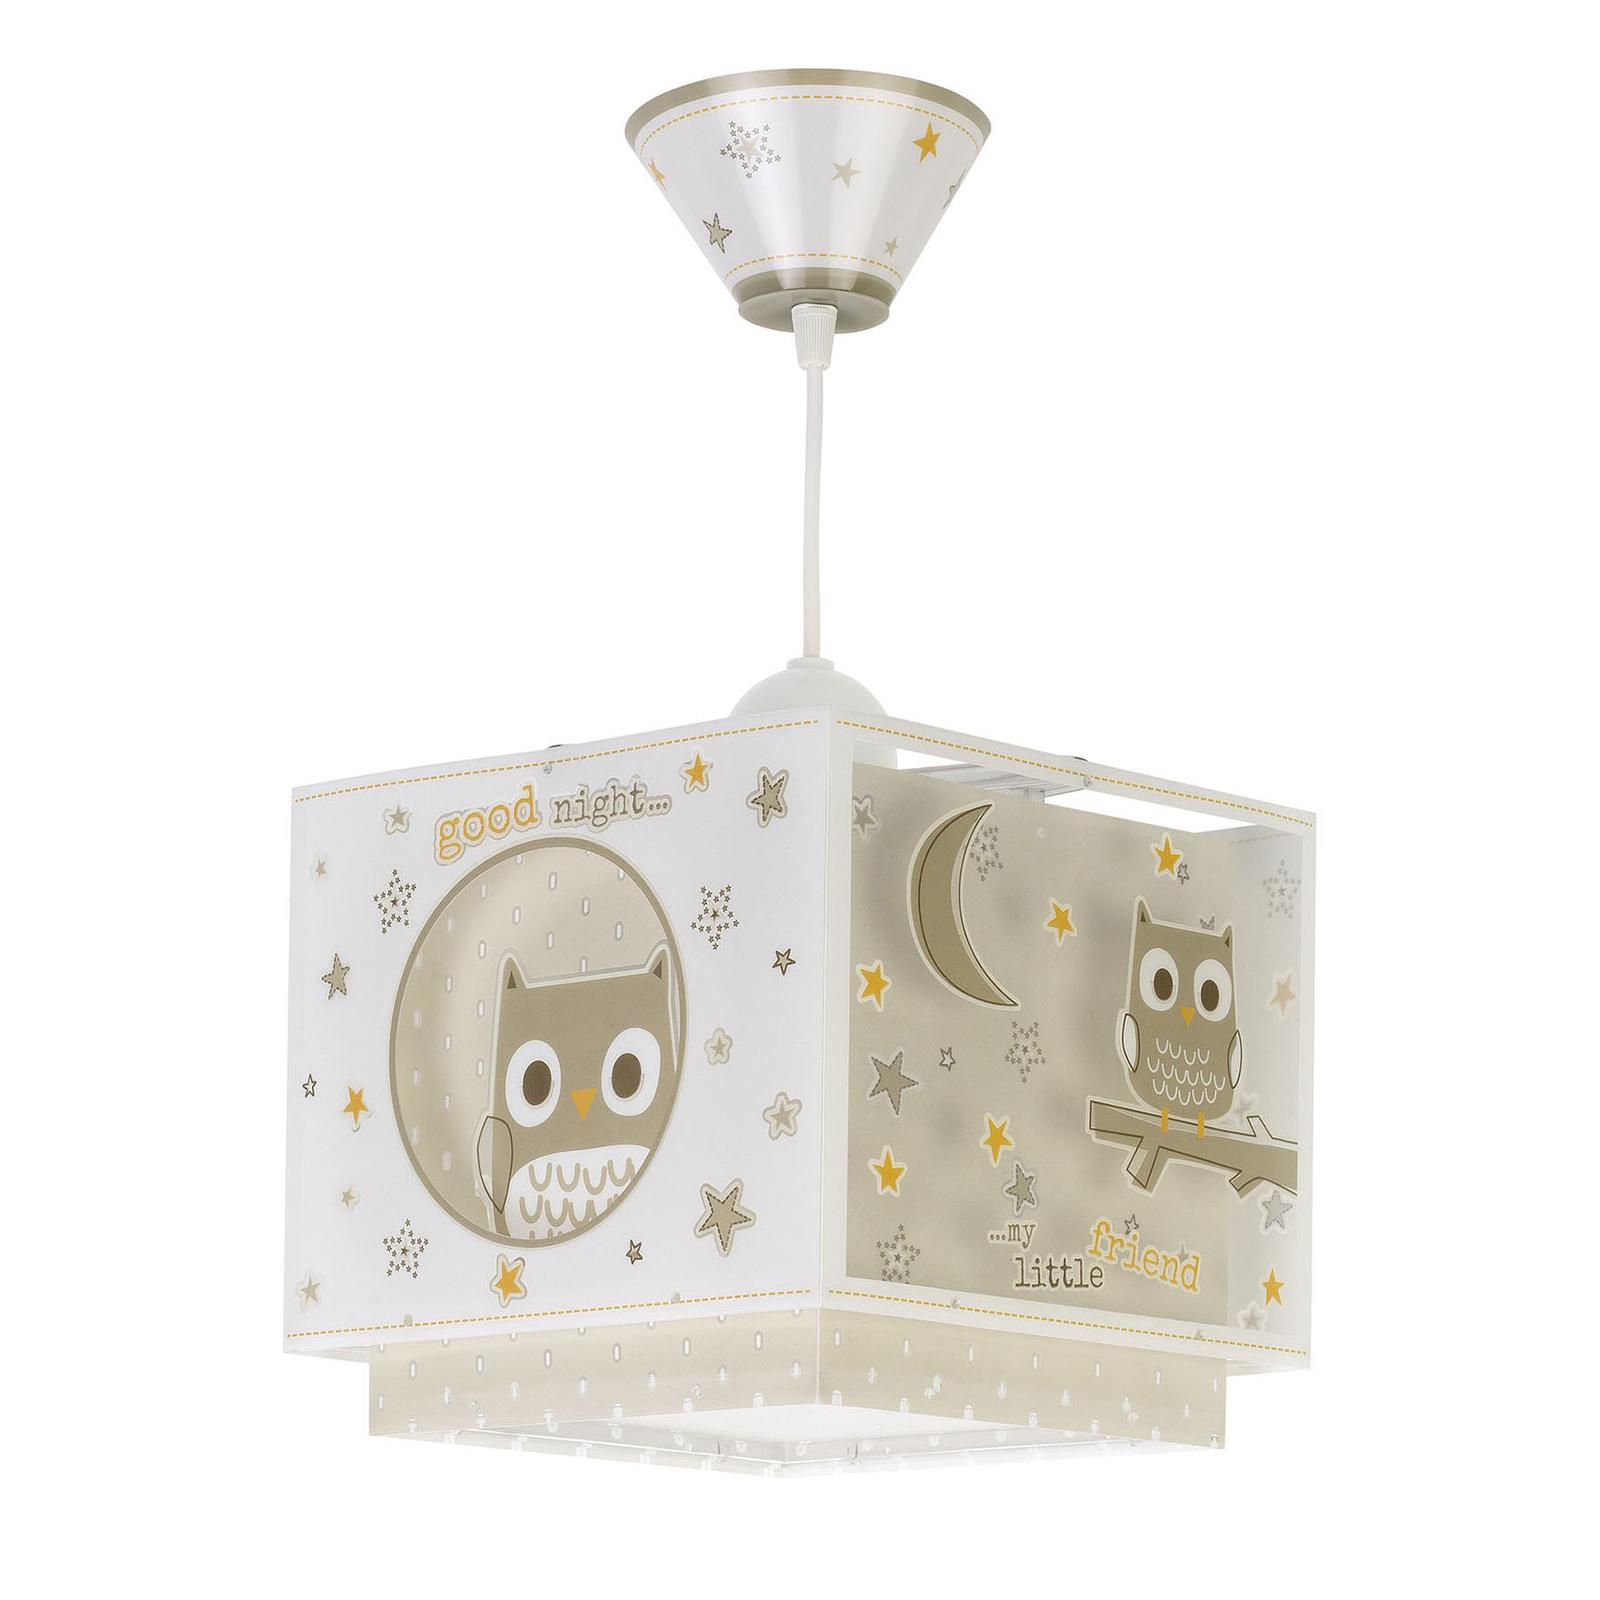 Kinderkamer hanglamp Good Night, 1-lamp